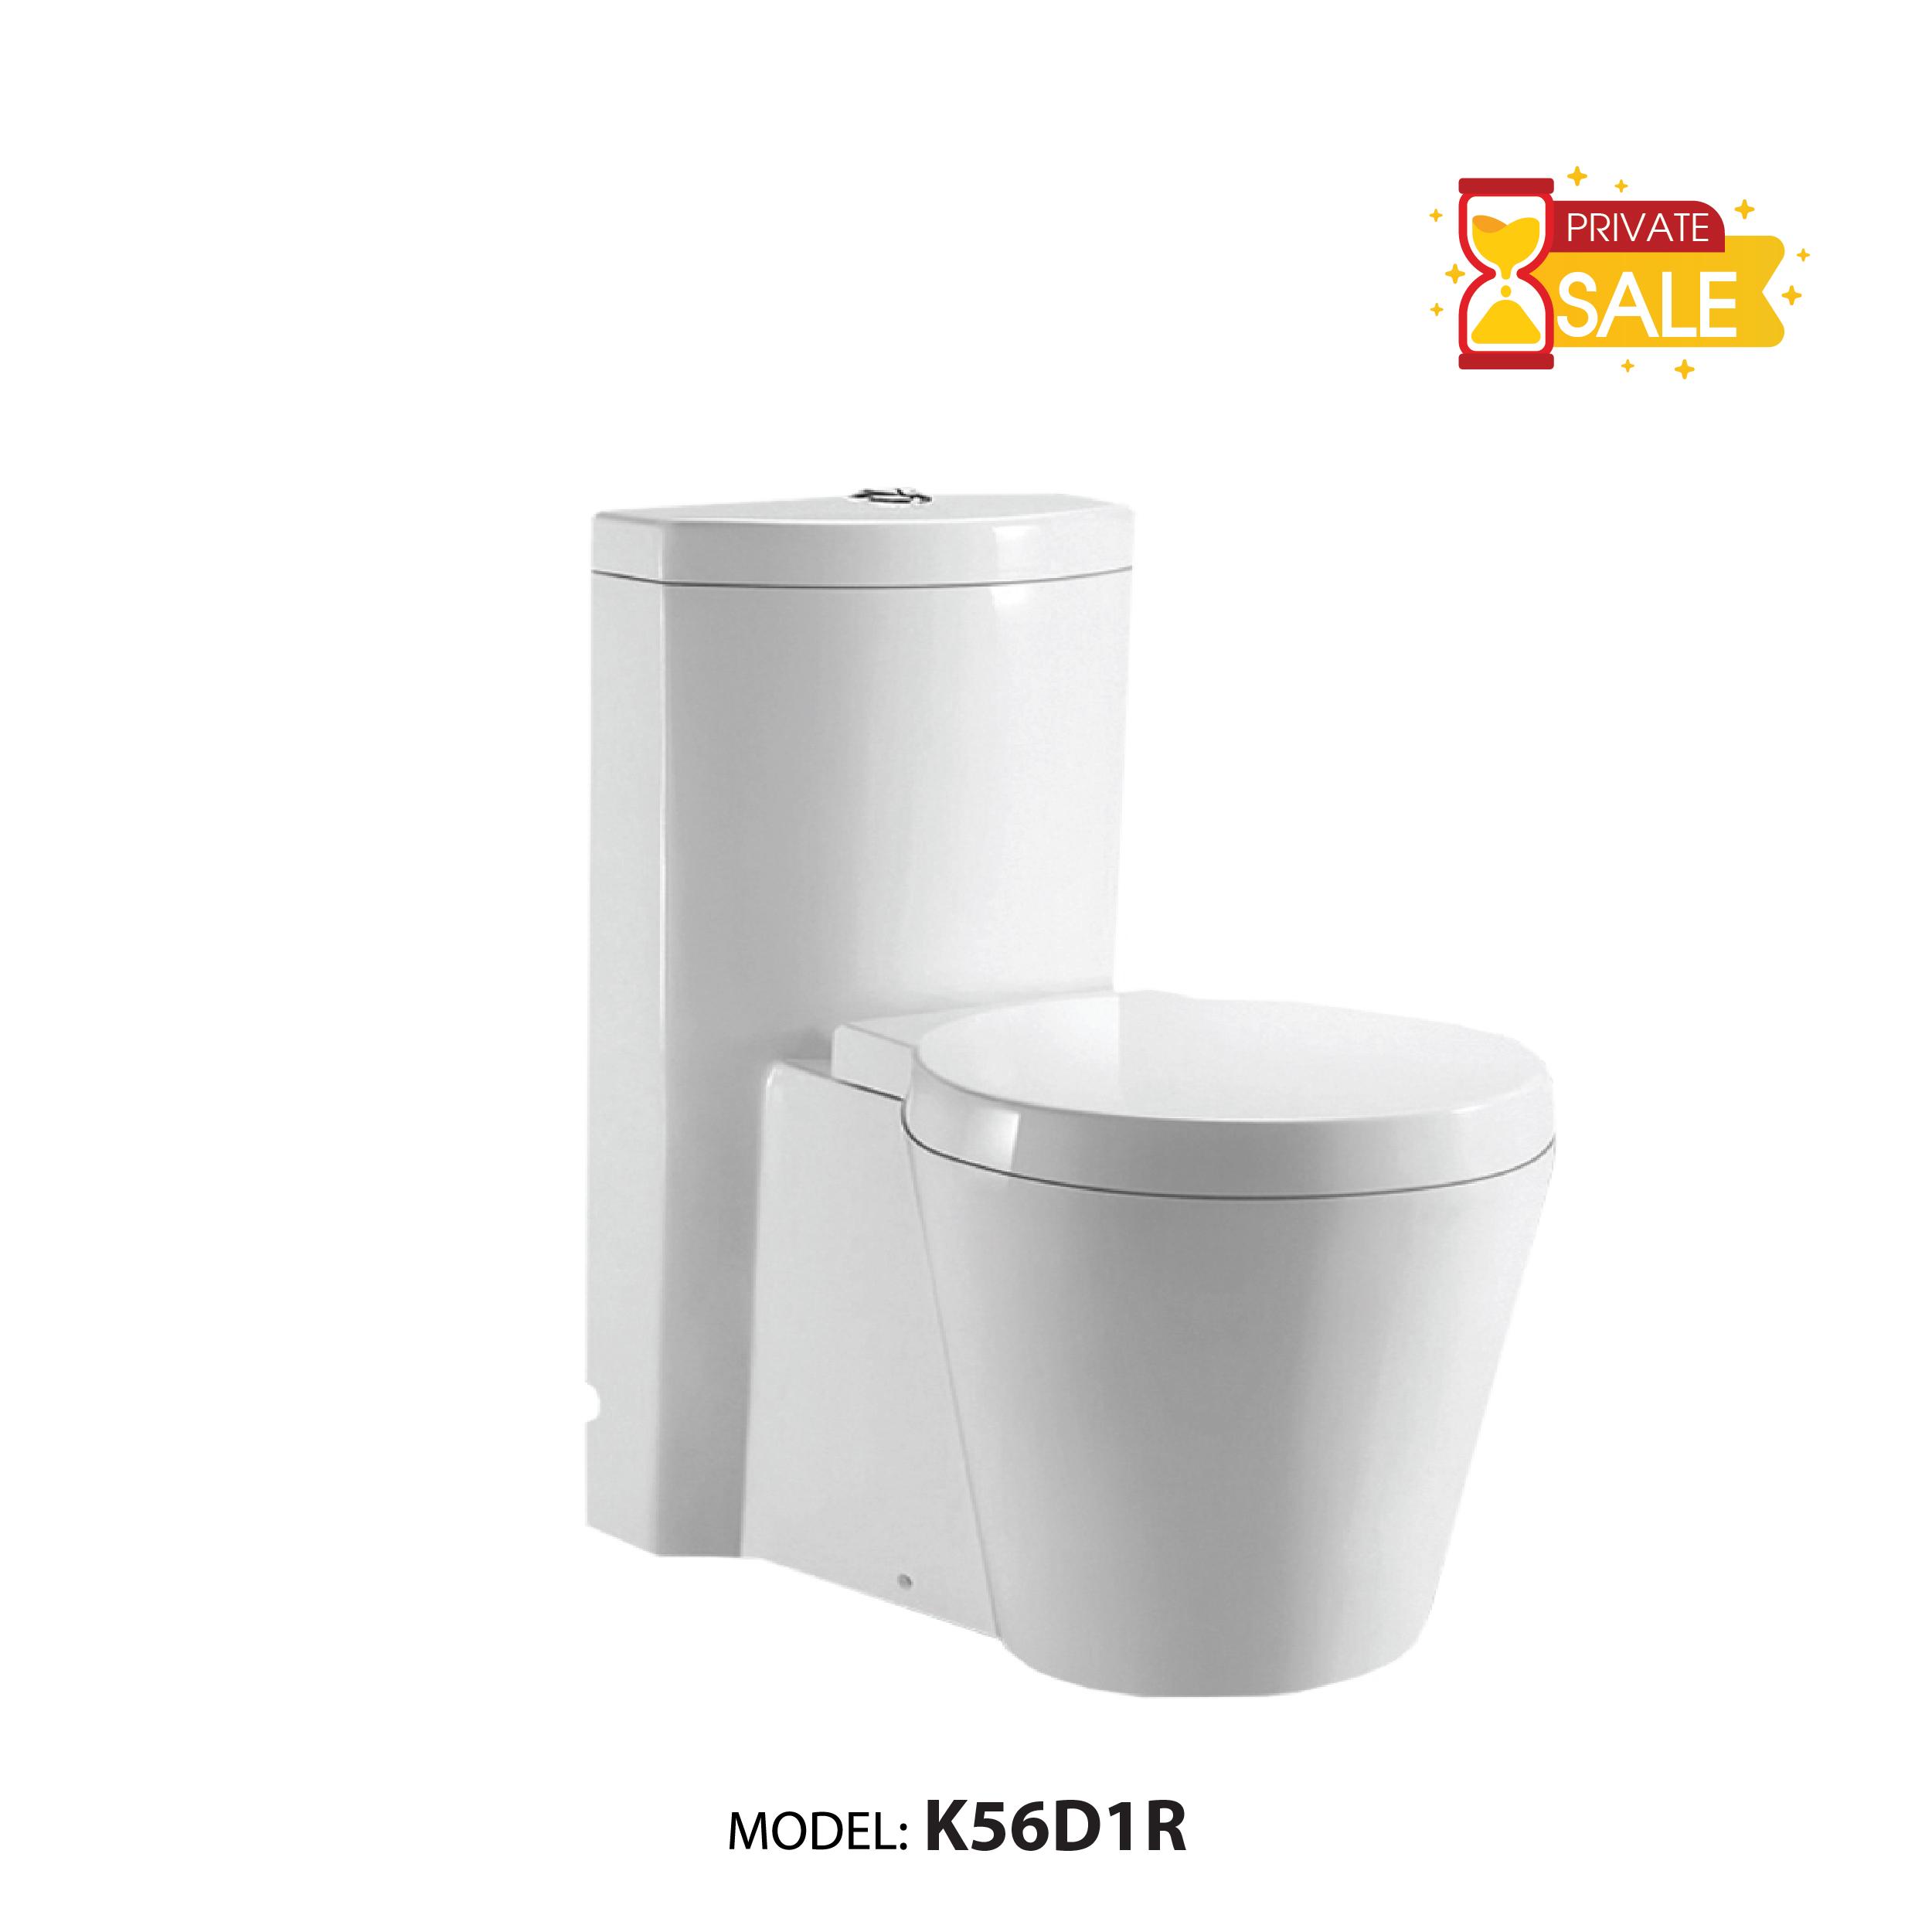 BỒN CẦU CARANO 1 KHỐI K56D1R (TOILET MODEL: K56D1R)